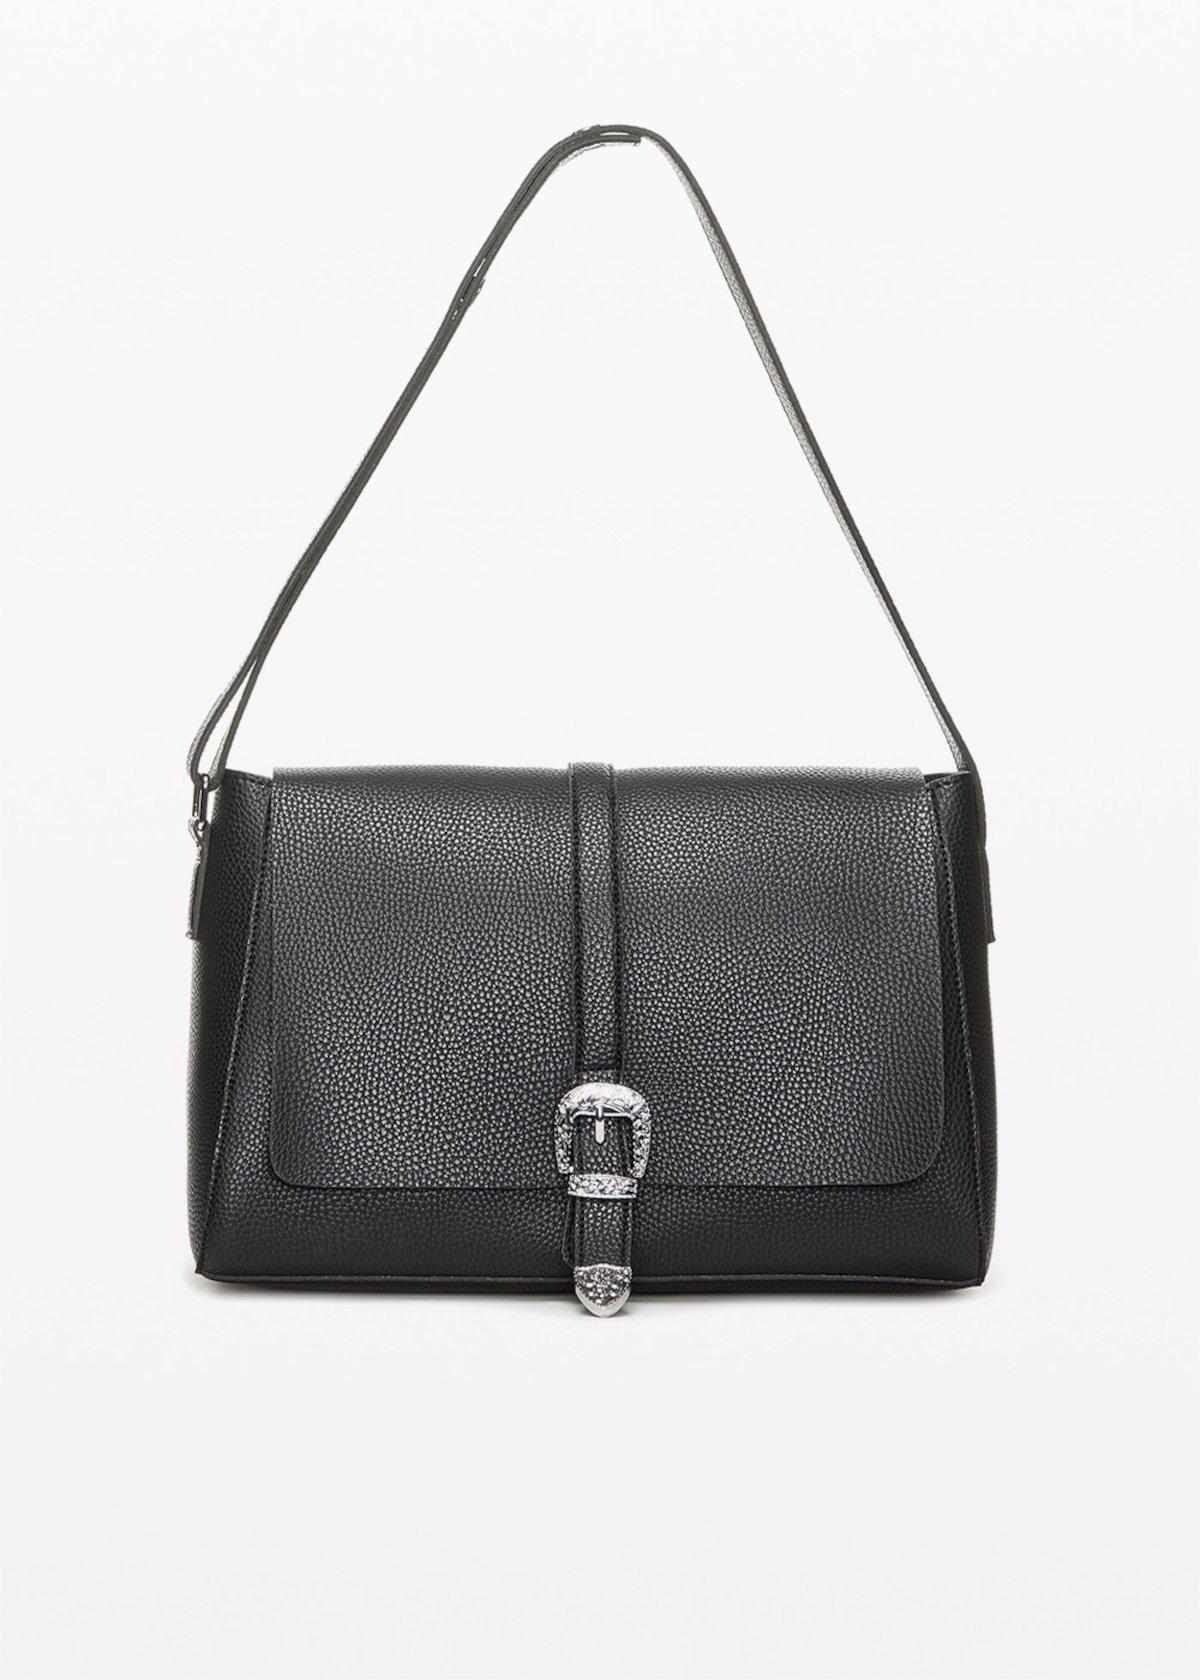 Boraliatx shopping bag with metal closure - Black - Woman